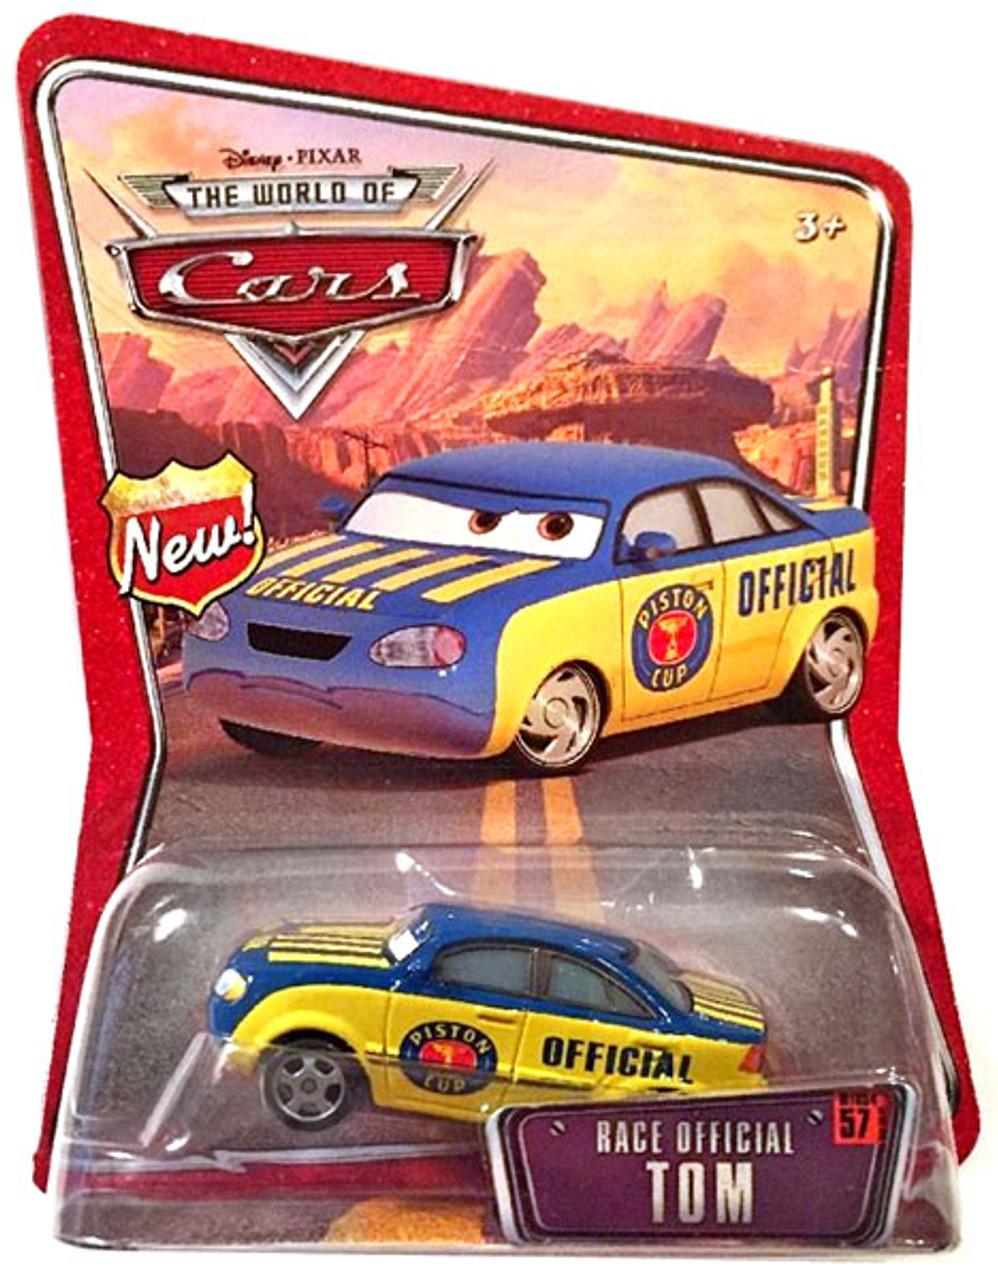 Disney Cars The World of Cars Race Official Tom Diecast Car